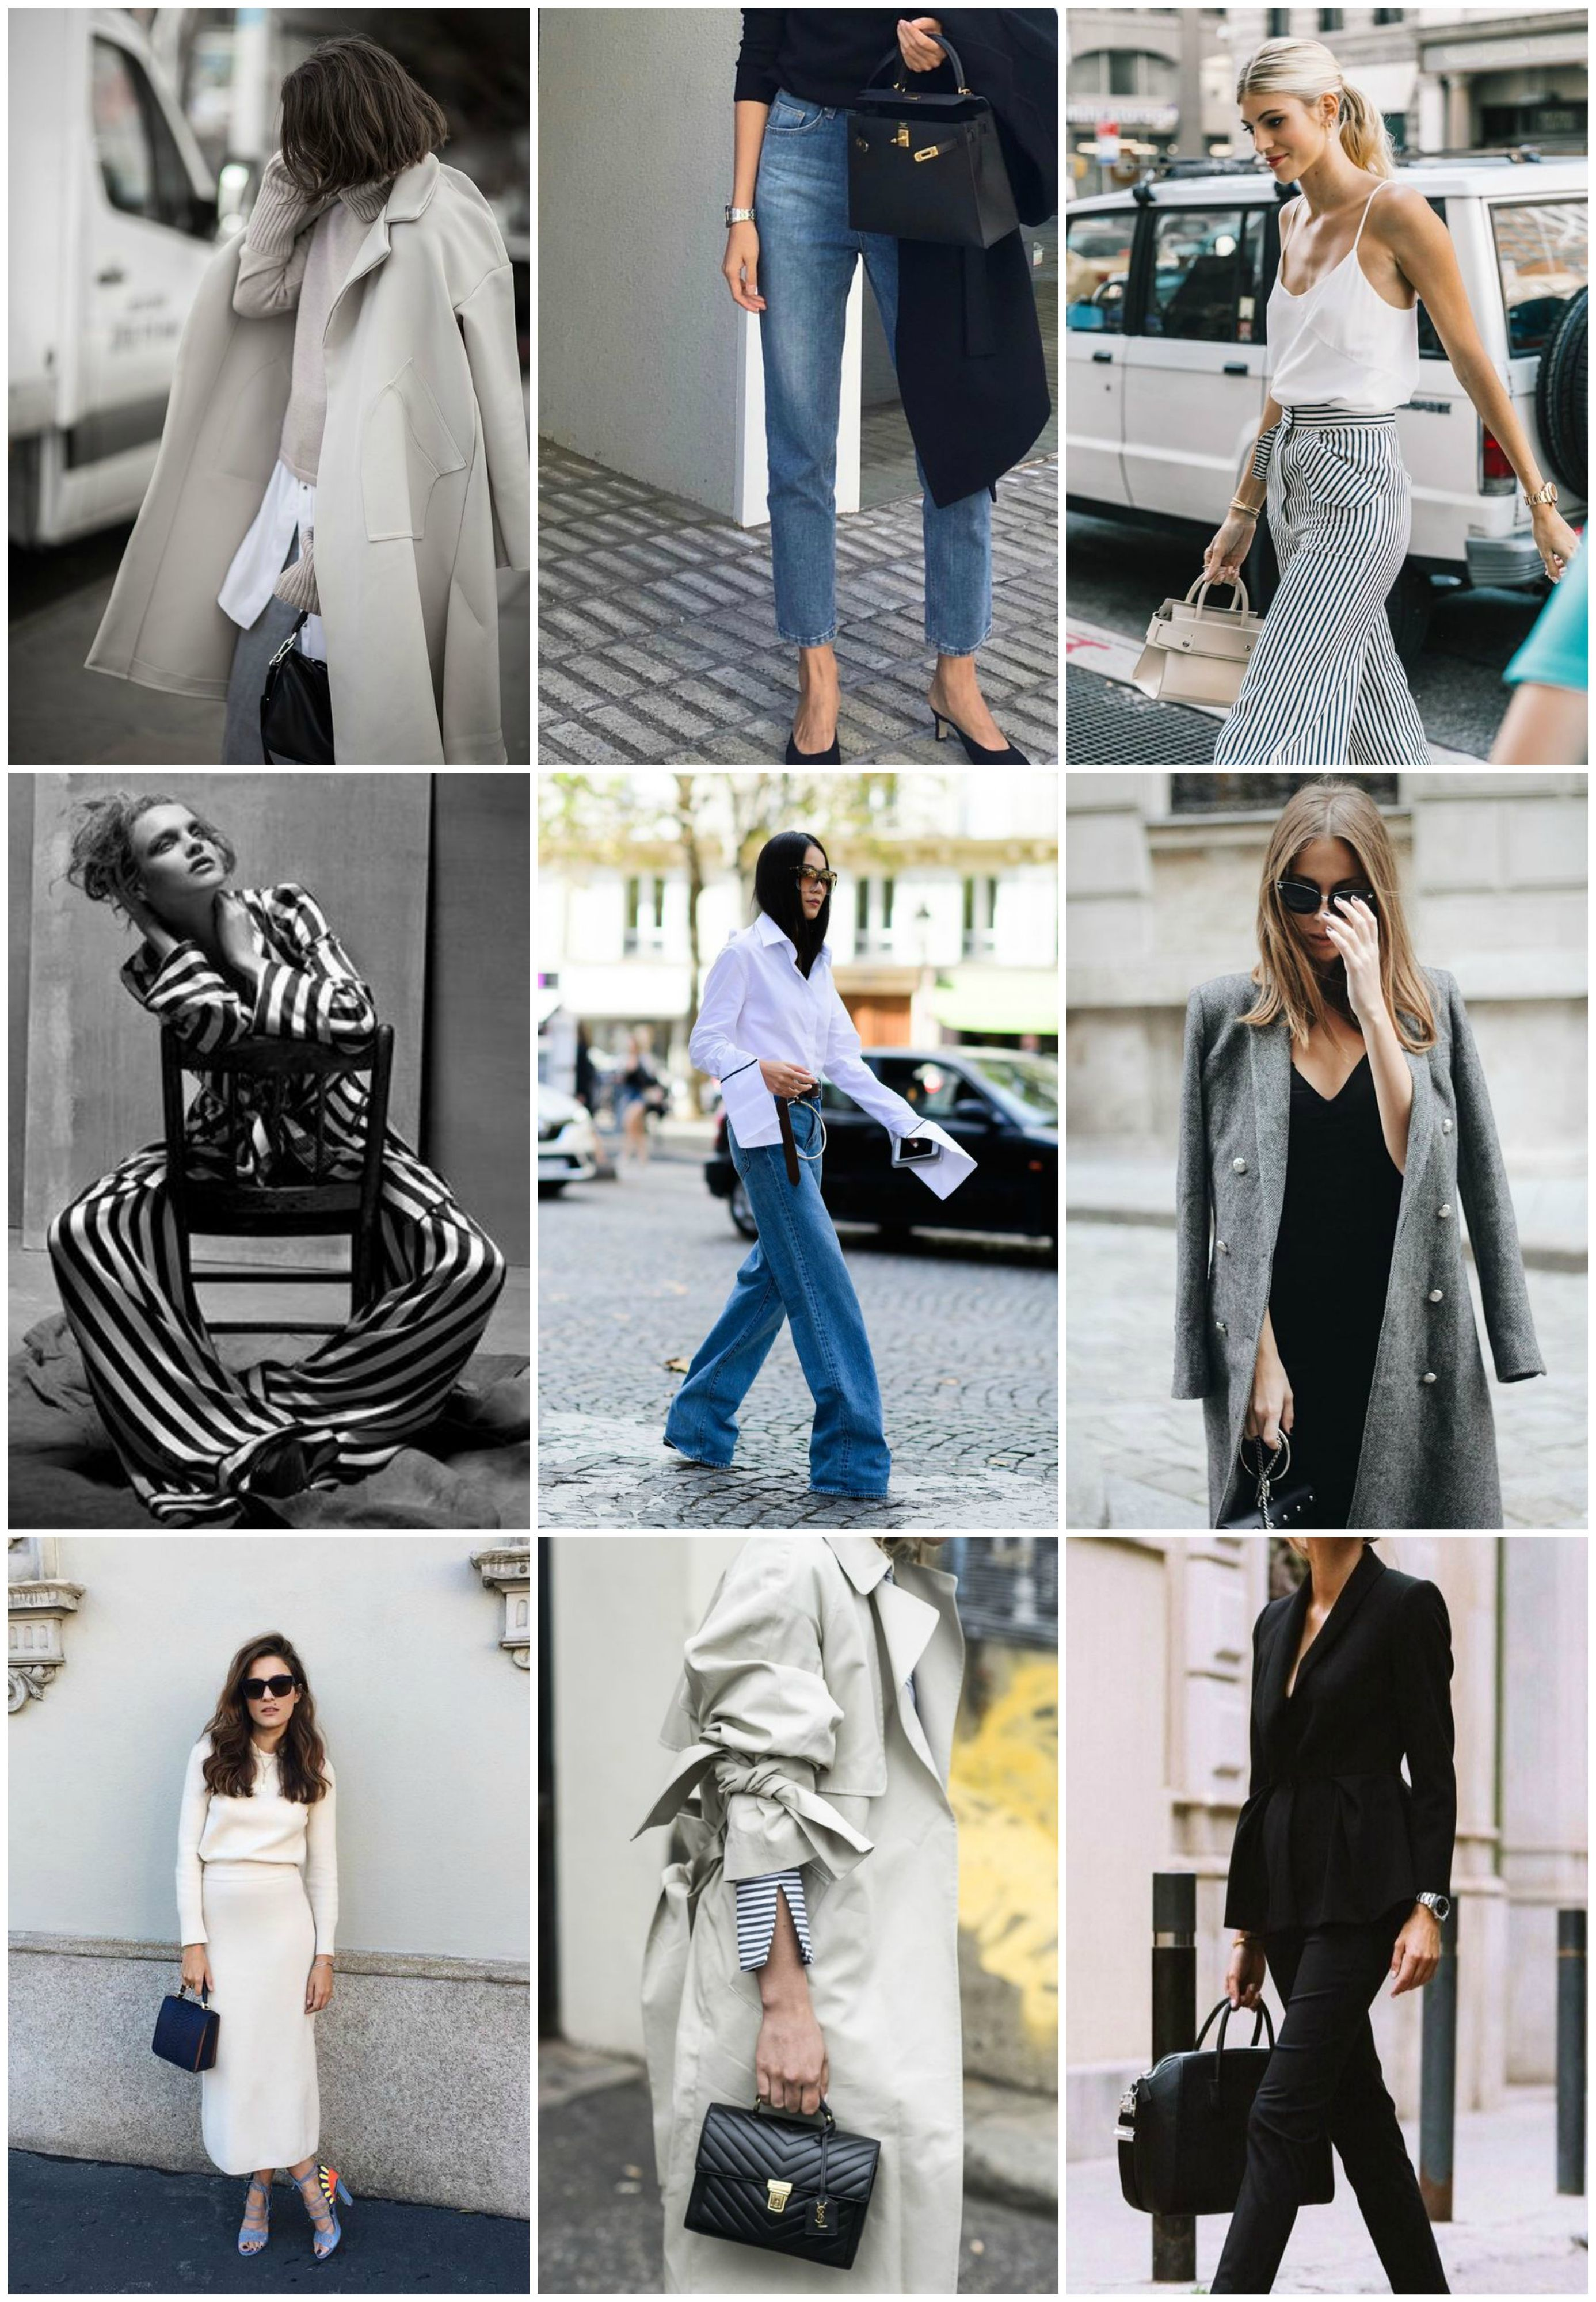 Spring Fashion Inspo Style Plaza Scandinavian Fashion Blogger Fashion Scandinavian Fashion Fashion Inspo